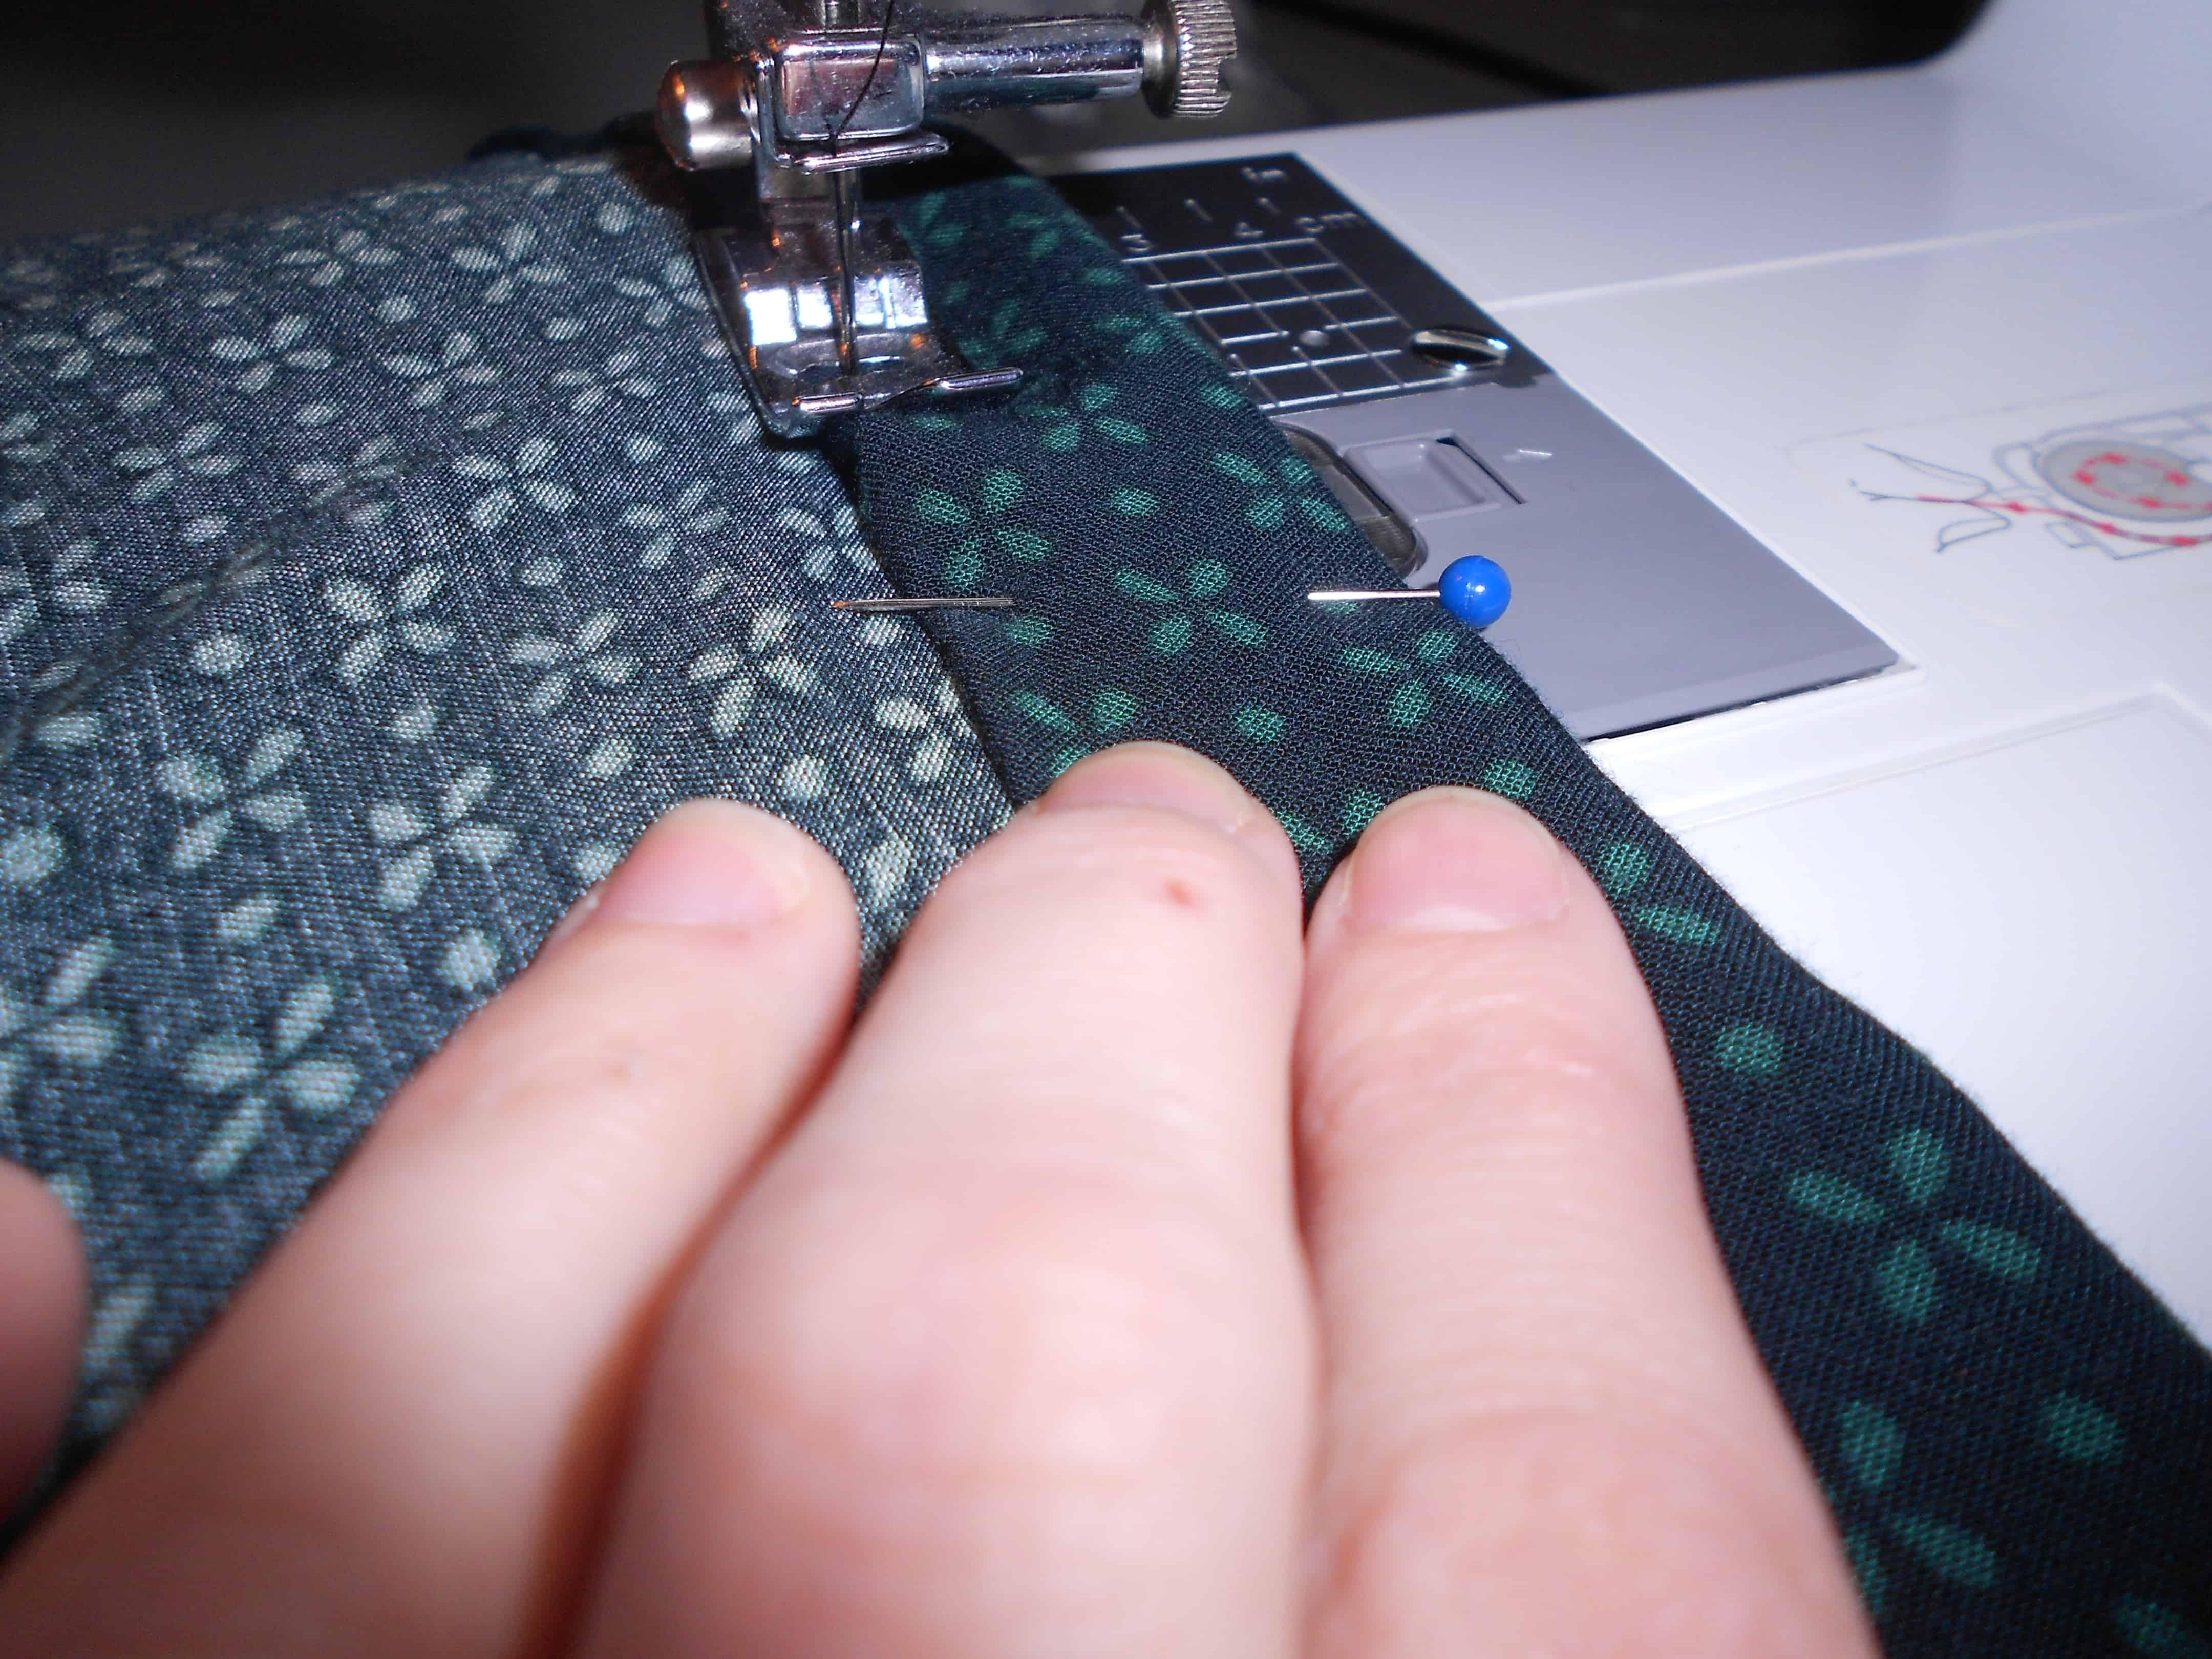 sewing new hem of dress